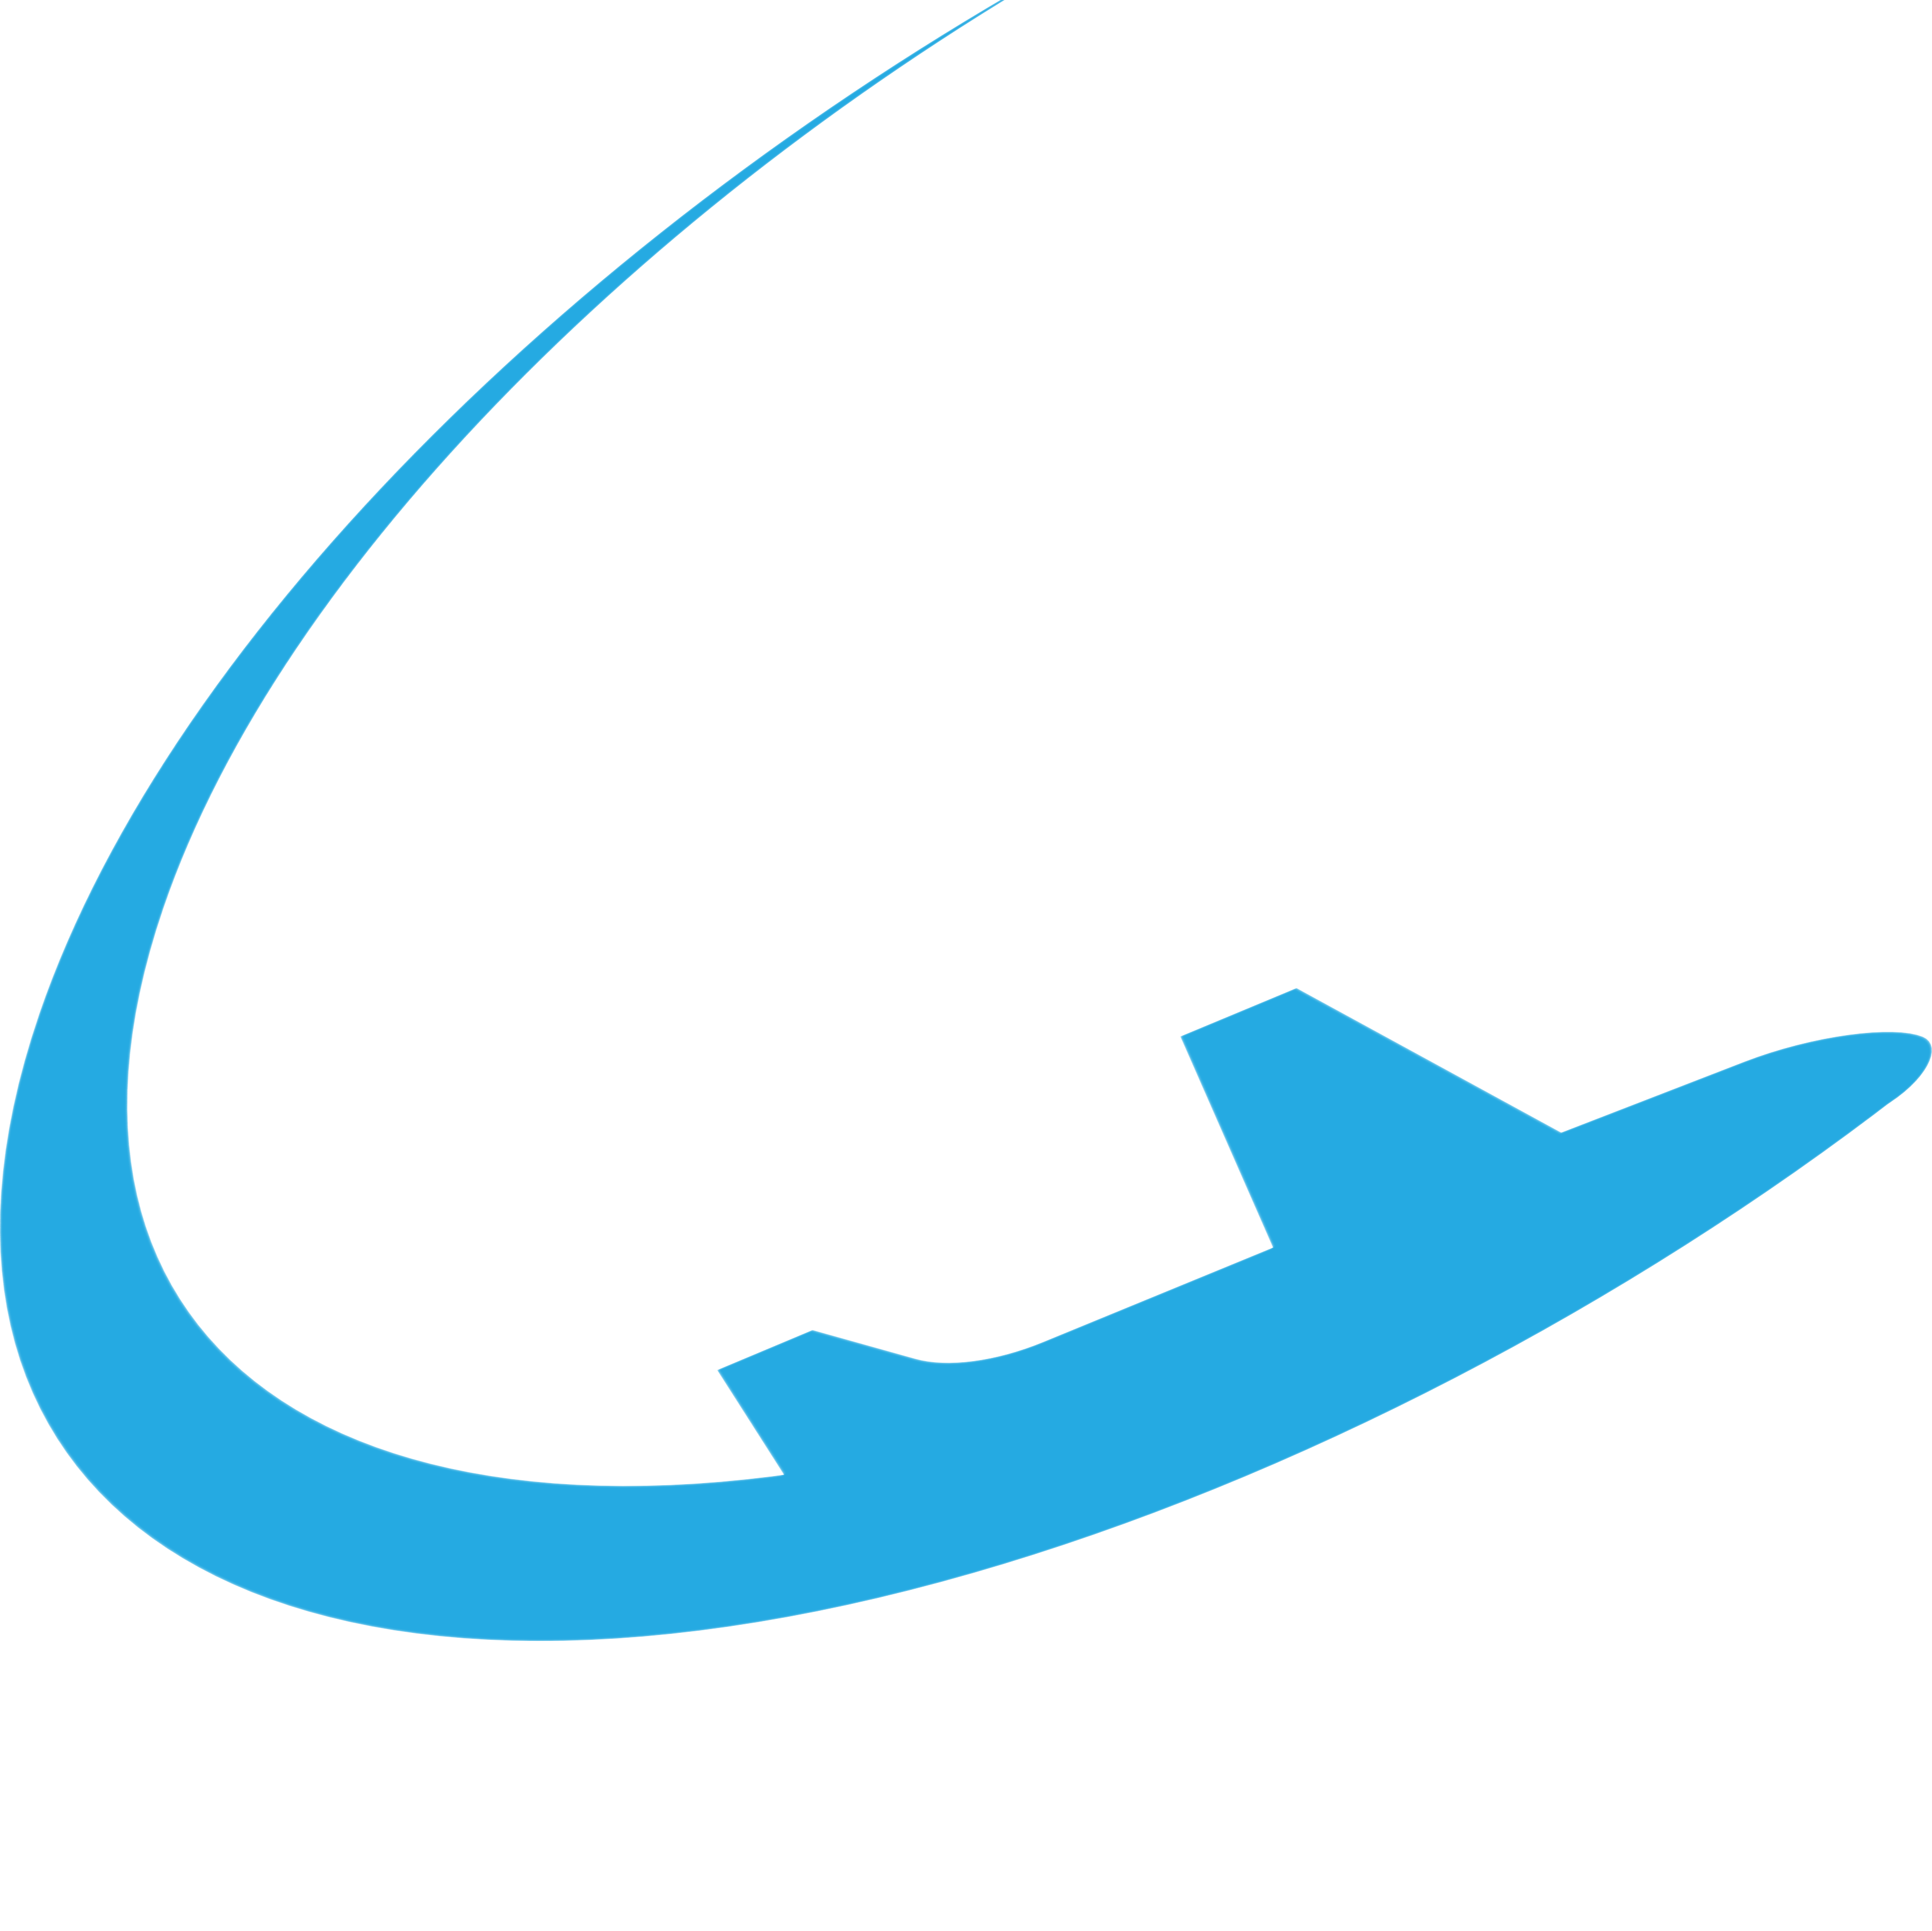 Plane Logo Png images